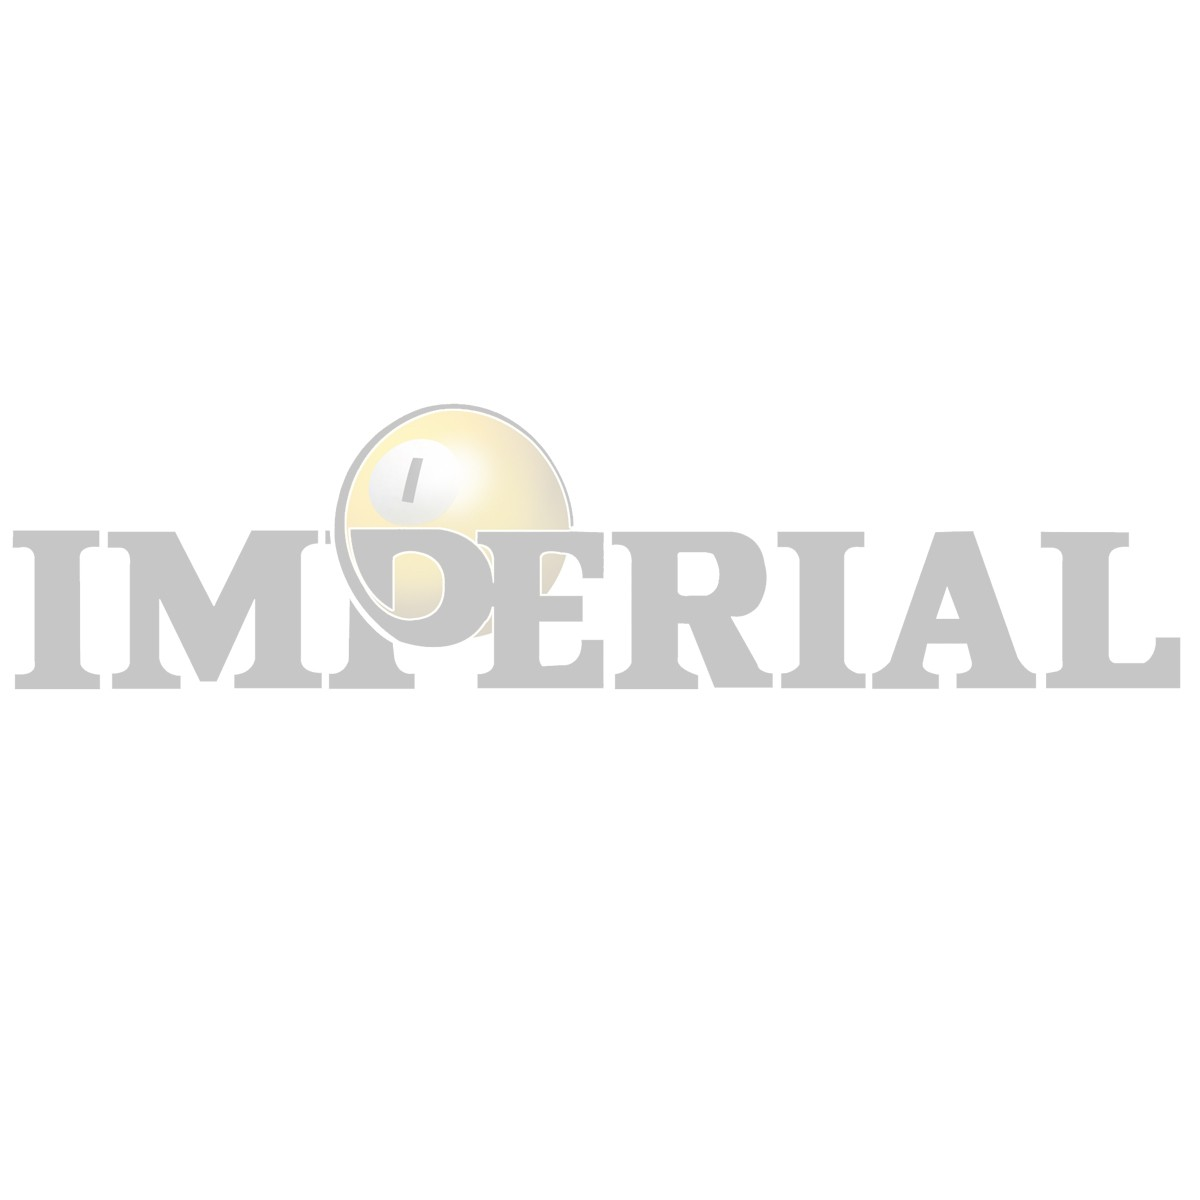 Imperial Universal Woodgrain Plastic Apron Miter, Set of 4